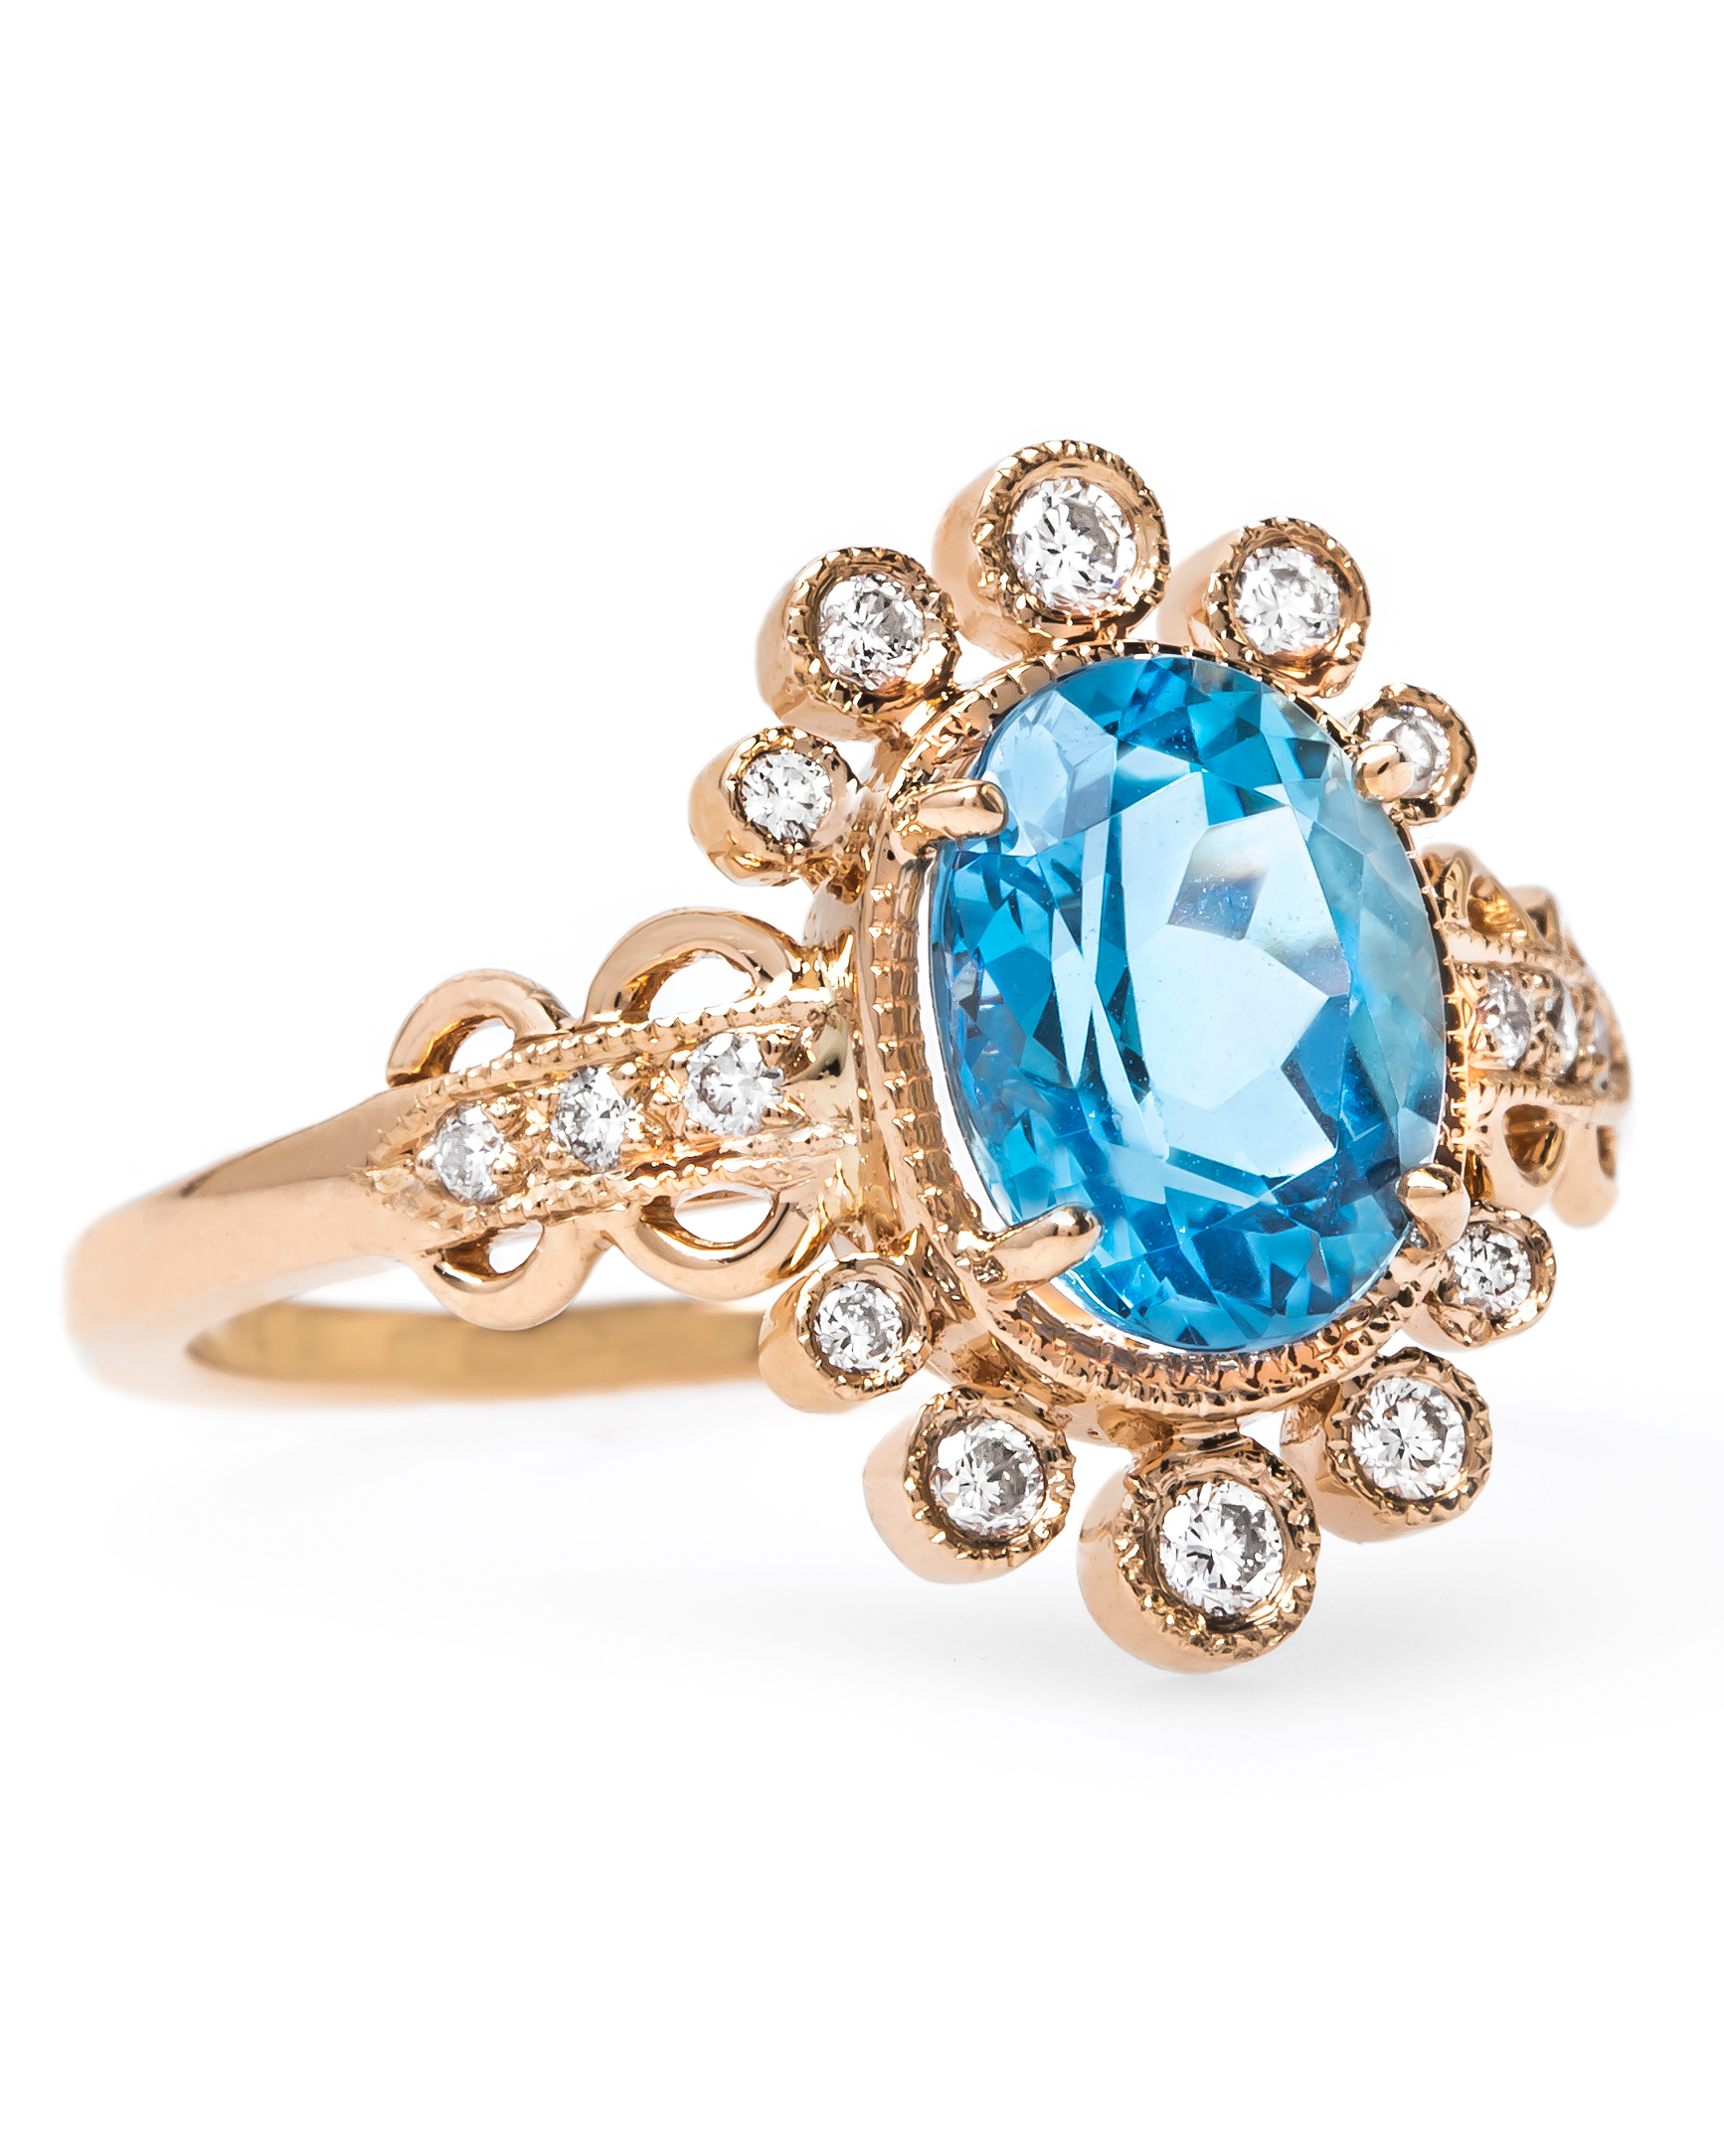 claire-pettibone-ring-collection-ariel-0915.jpg